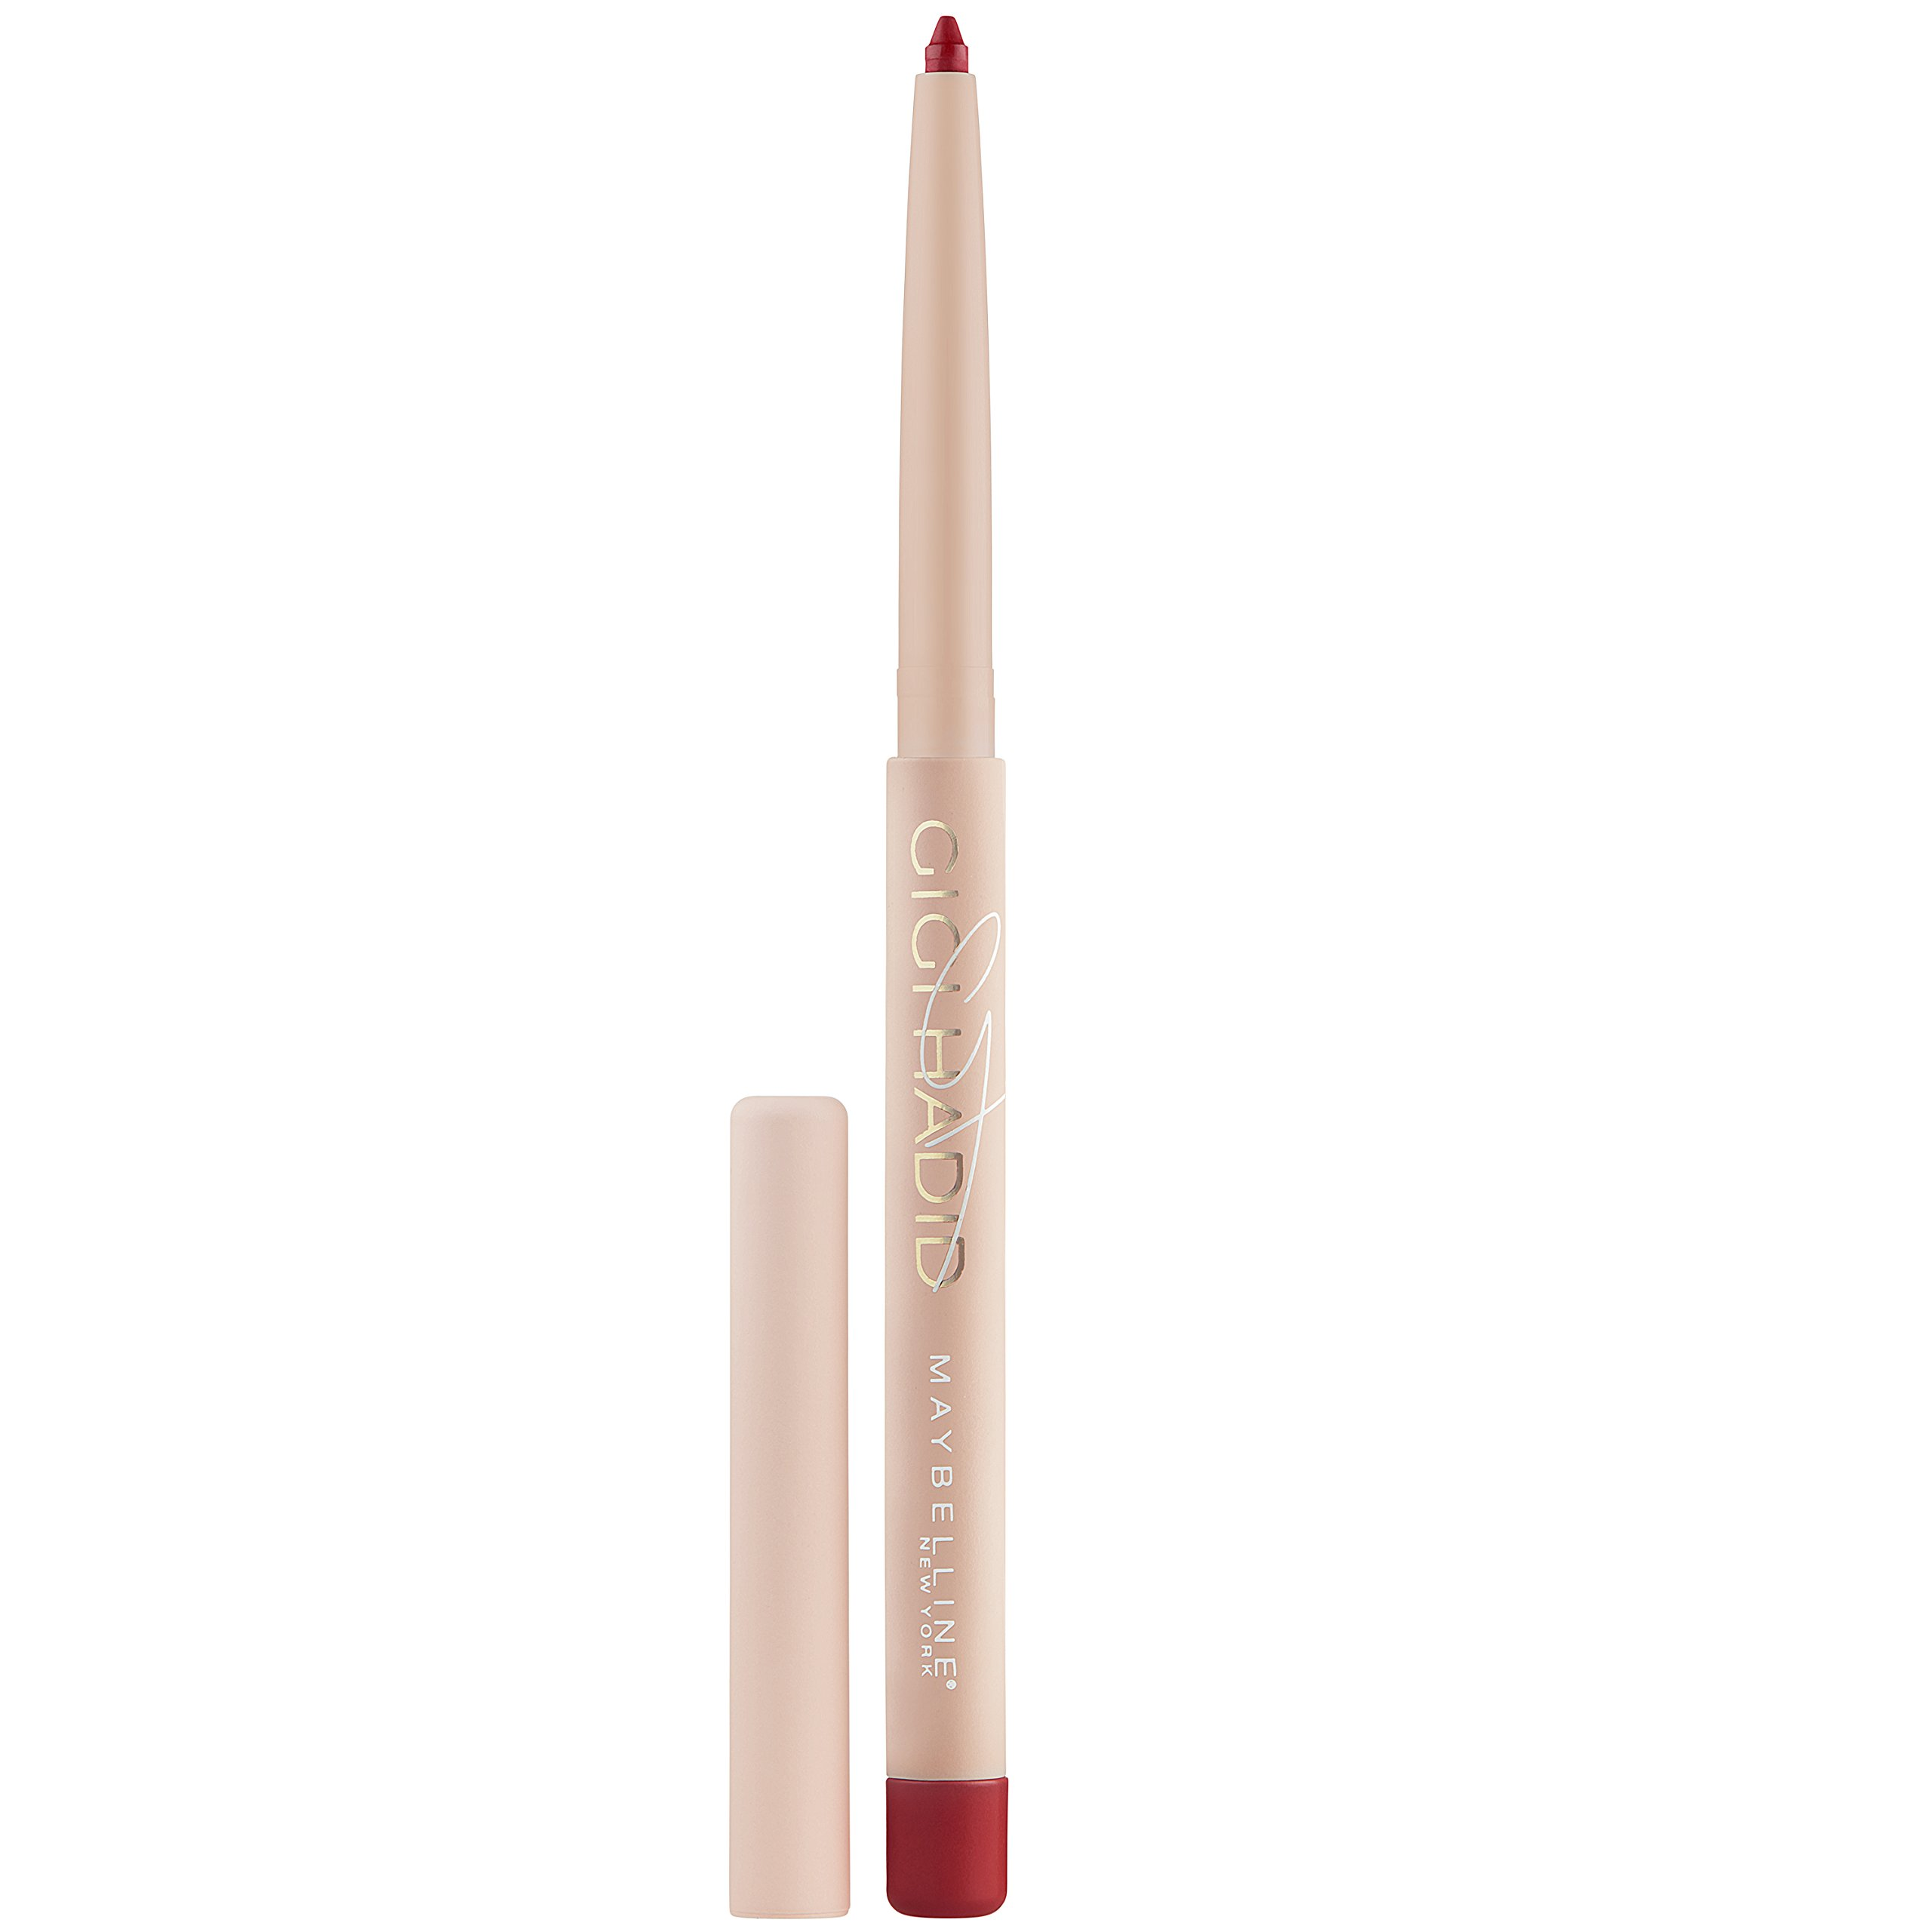 Maybelline New York Gigi Hadid Matte Lipstick Lani Ql Cosmetic Eyebrow Cream 15 Gr Lip Liner 001 Ounce